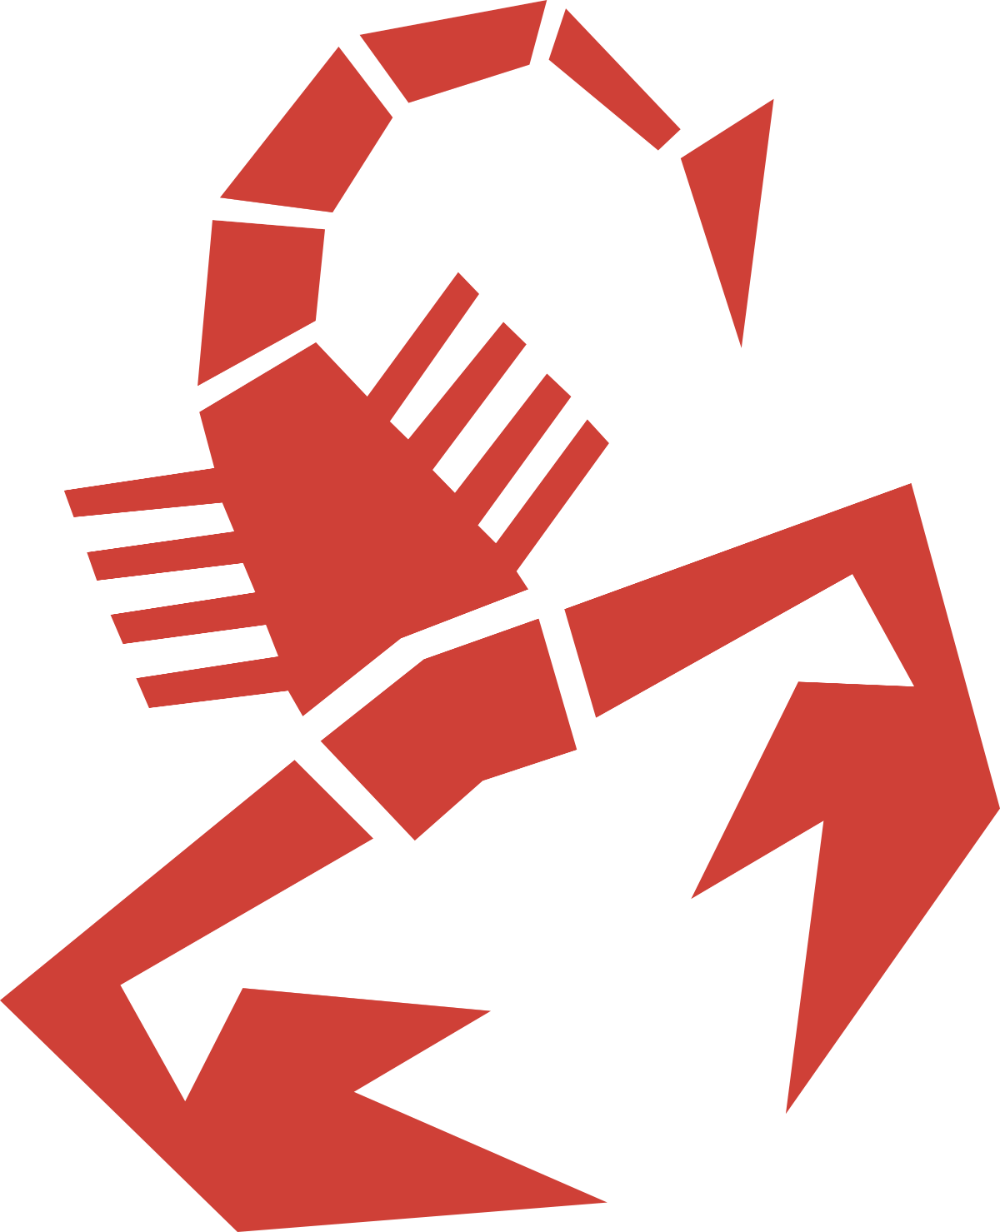 Fiat Scorpion Logo Png Transparent Svg Vector Freebie Supply Logos Scorpion Freebie